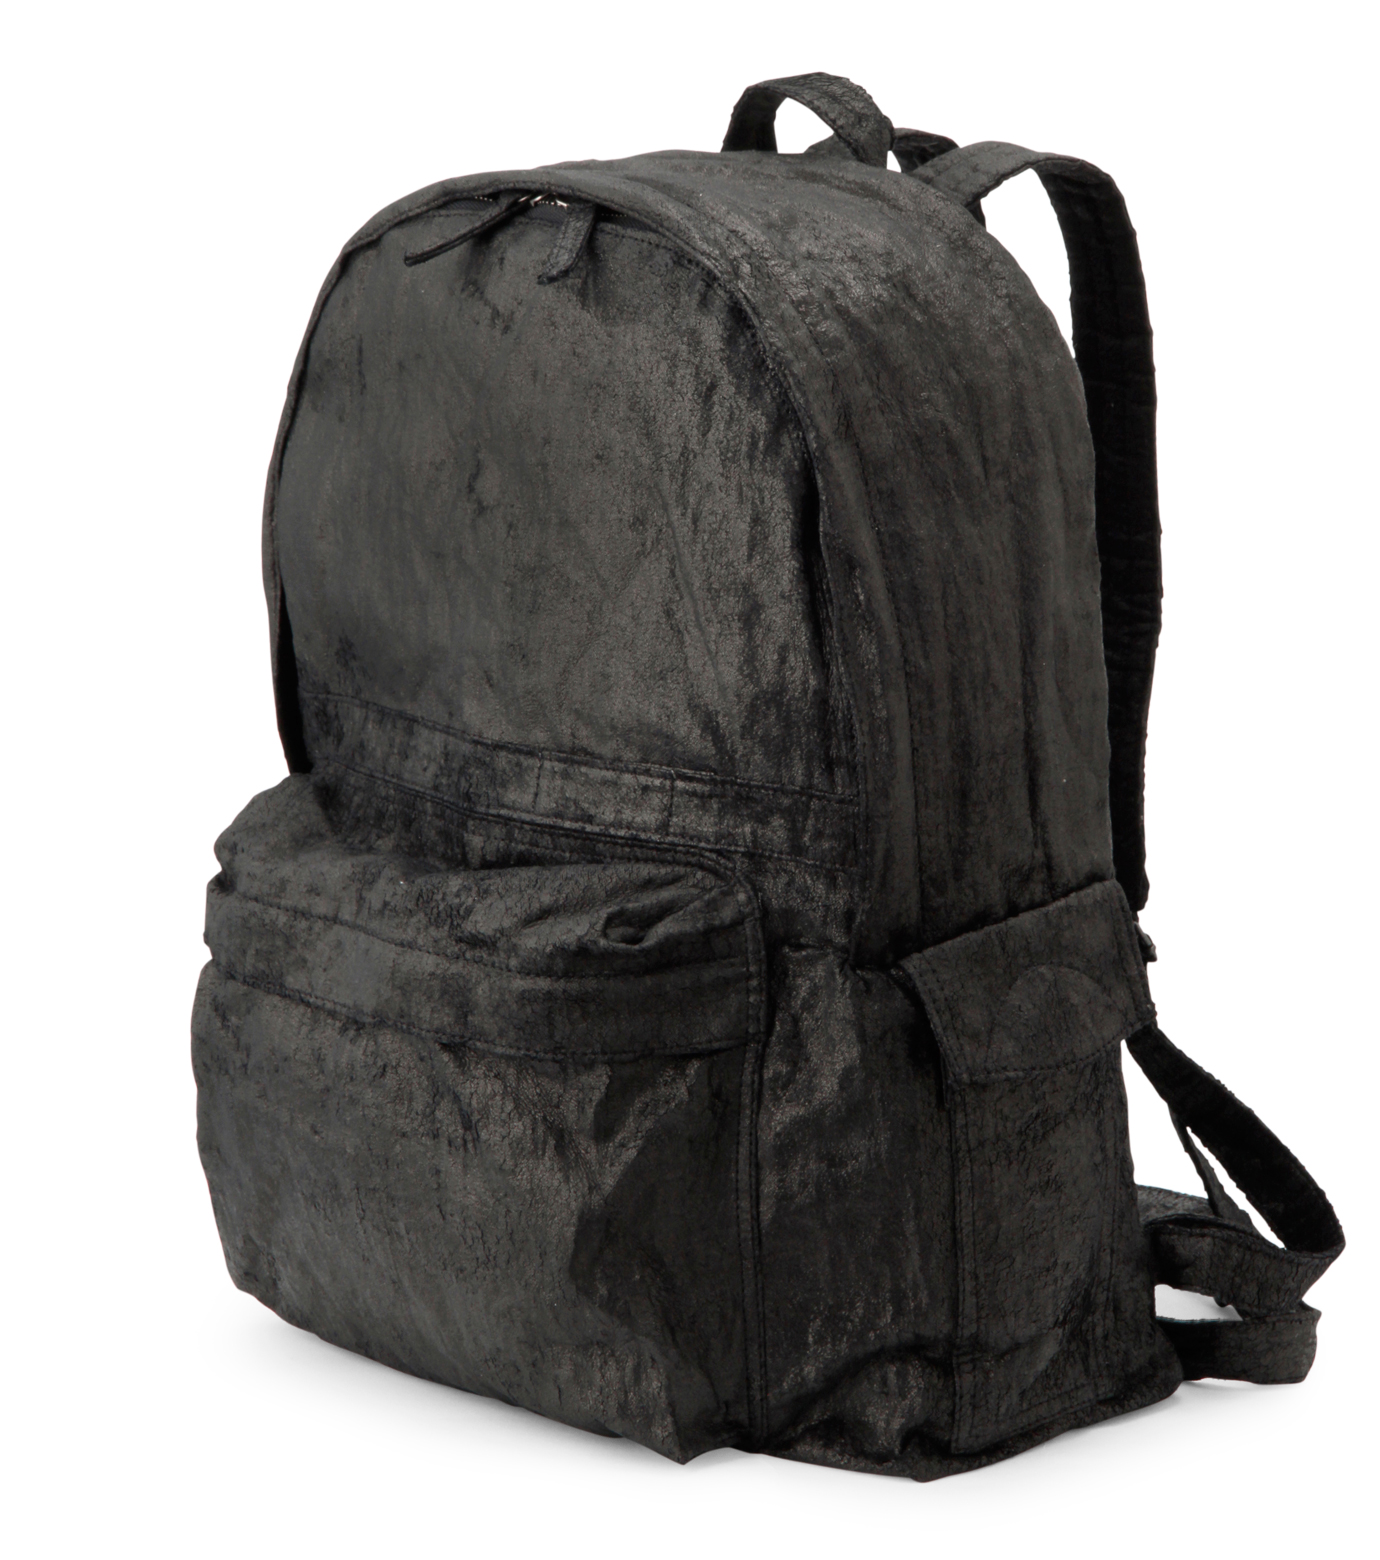 Ann Demeulemeester(アン ドゥムルメステール)のBack pack-BLACK-2102922008-13 拡大詳細画像2